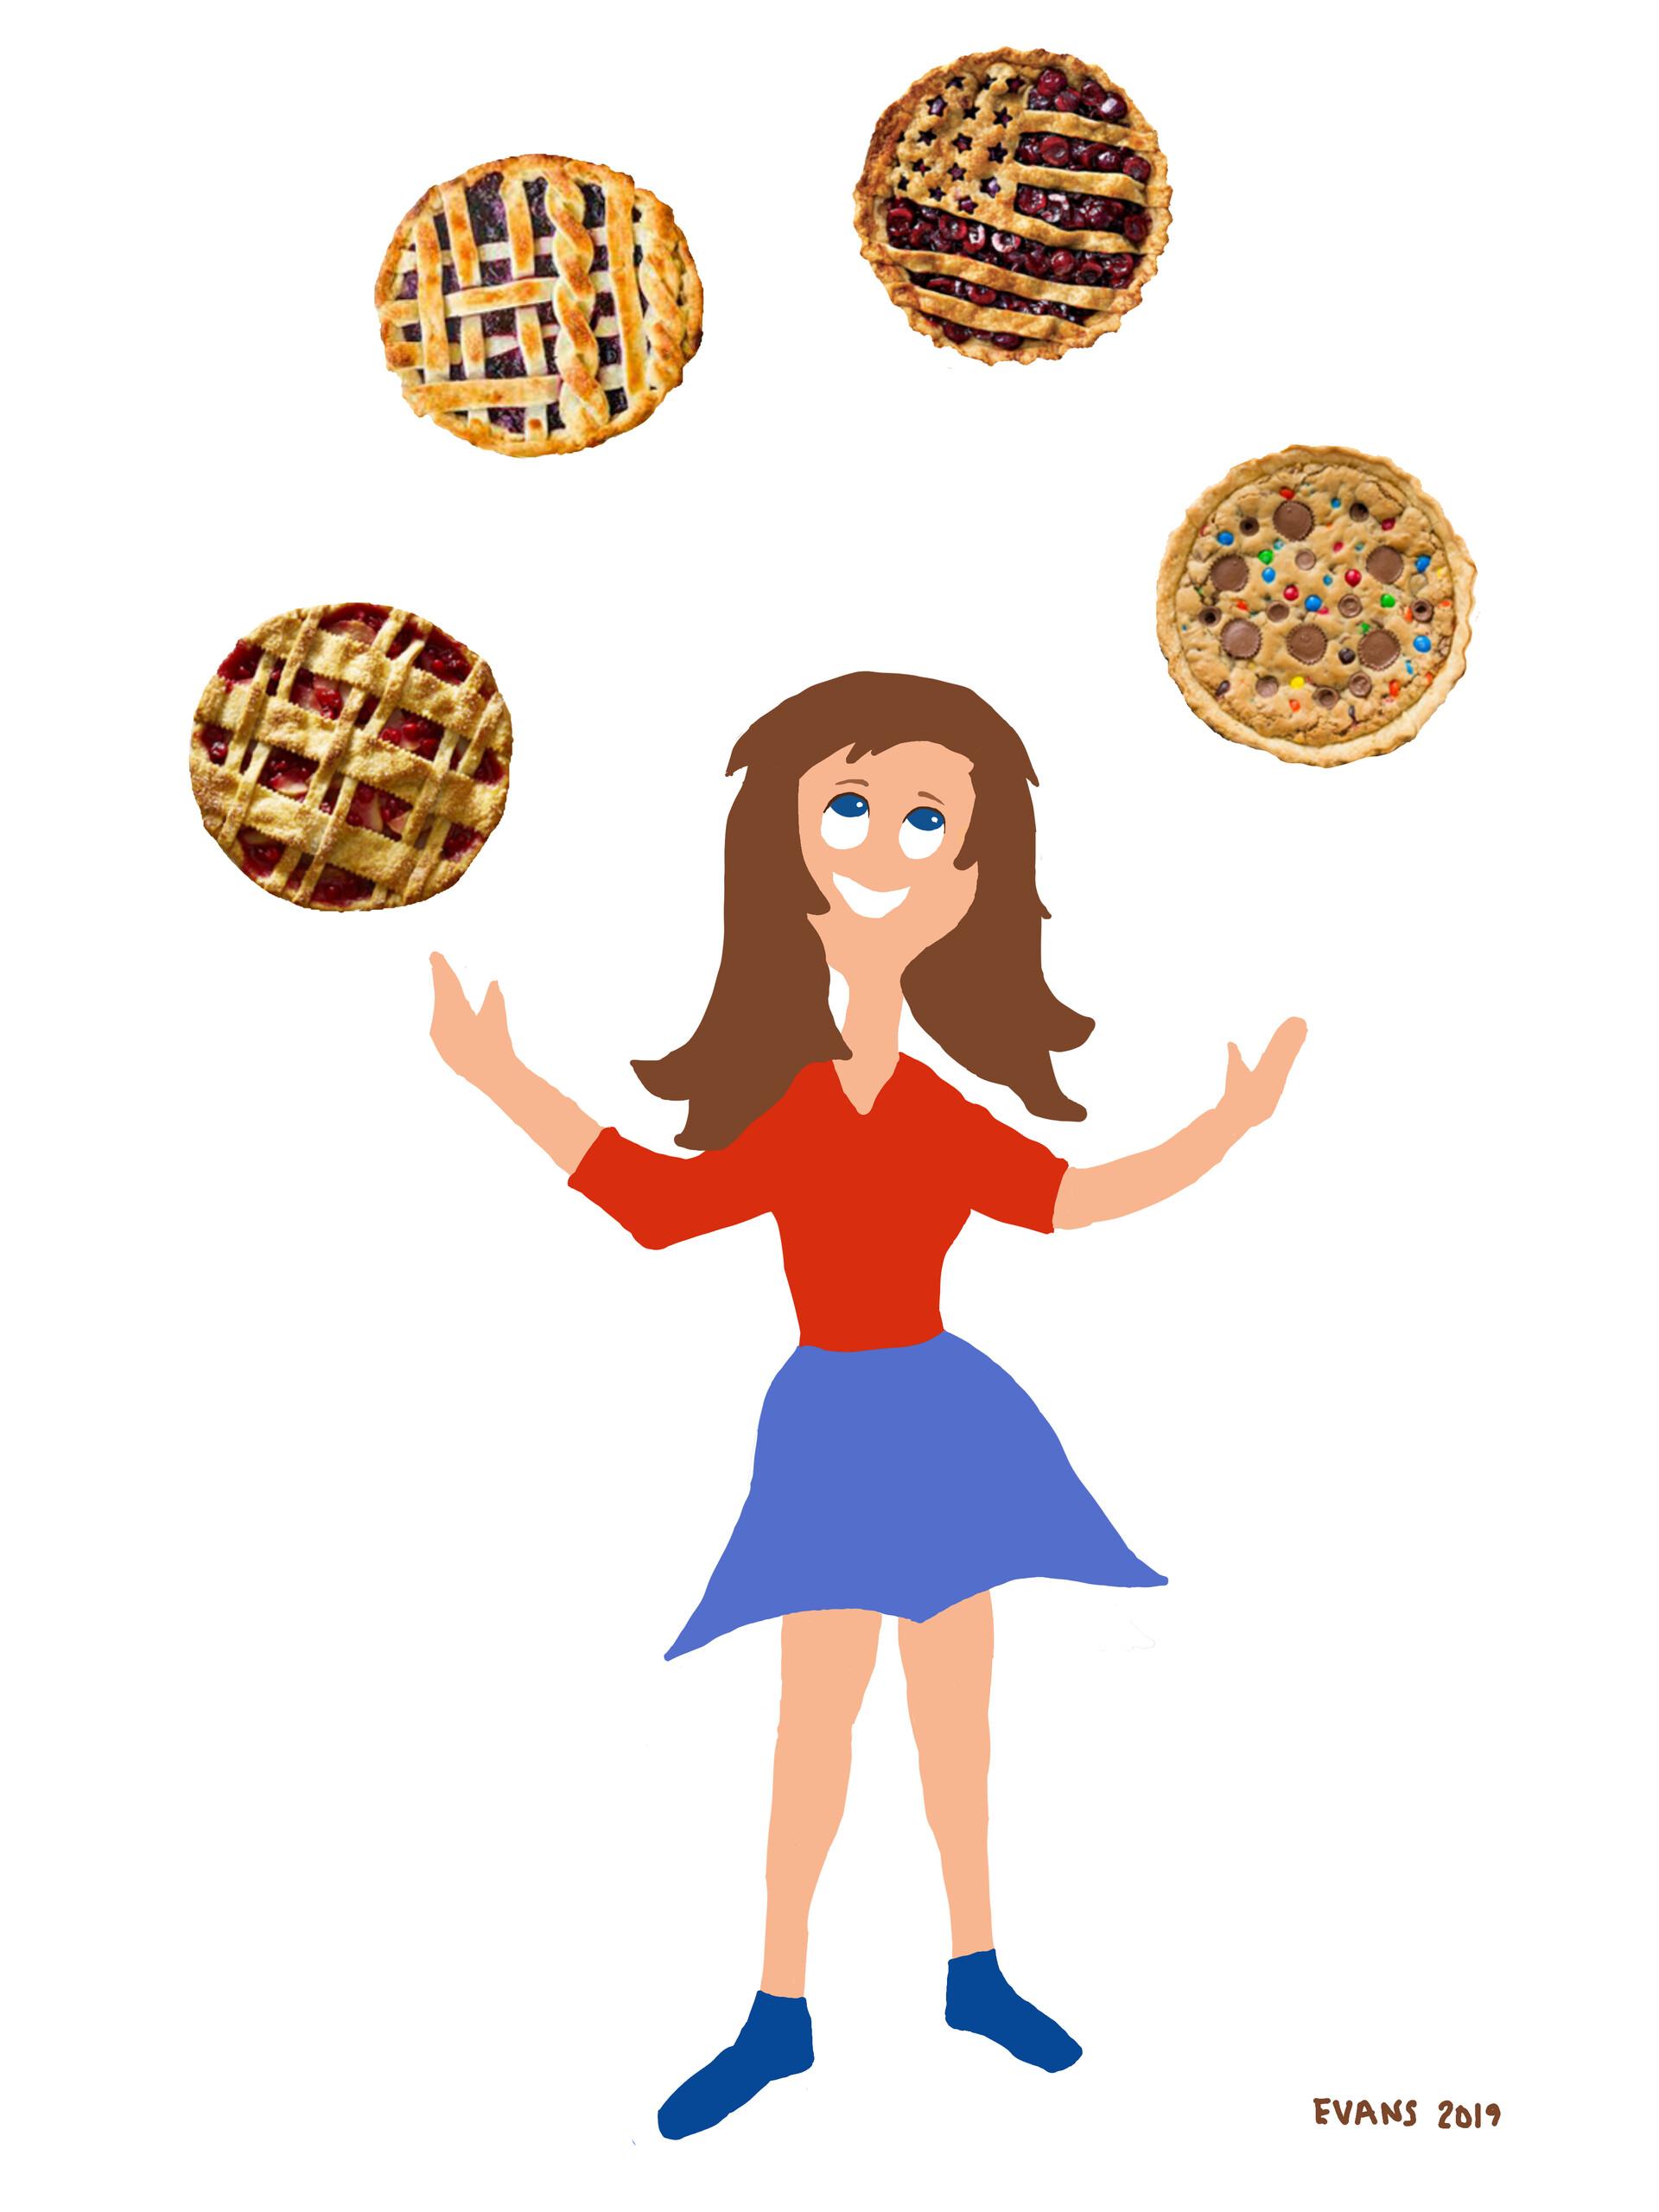 Juggling Pies 2019